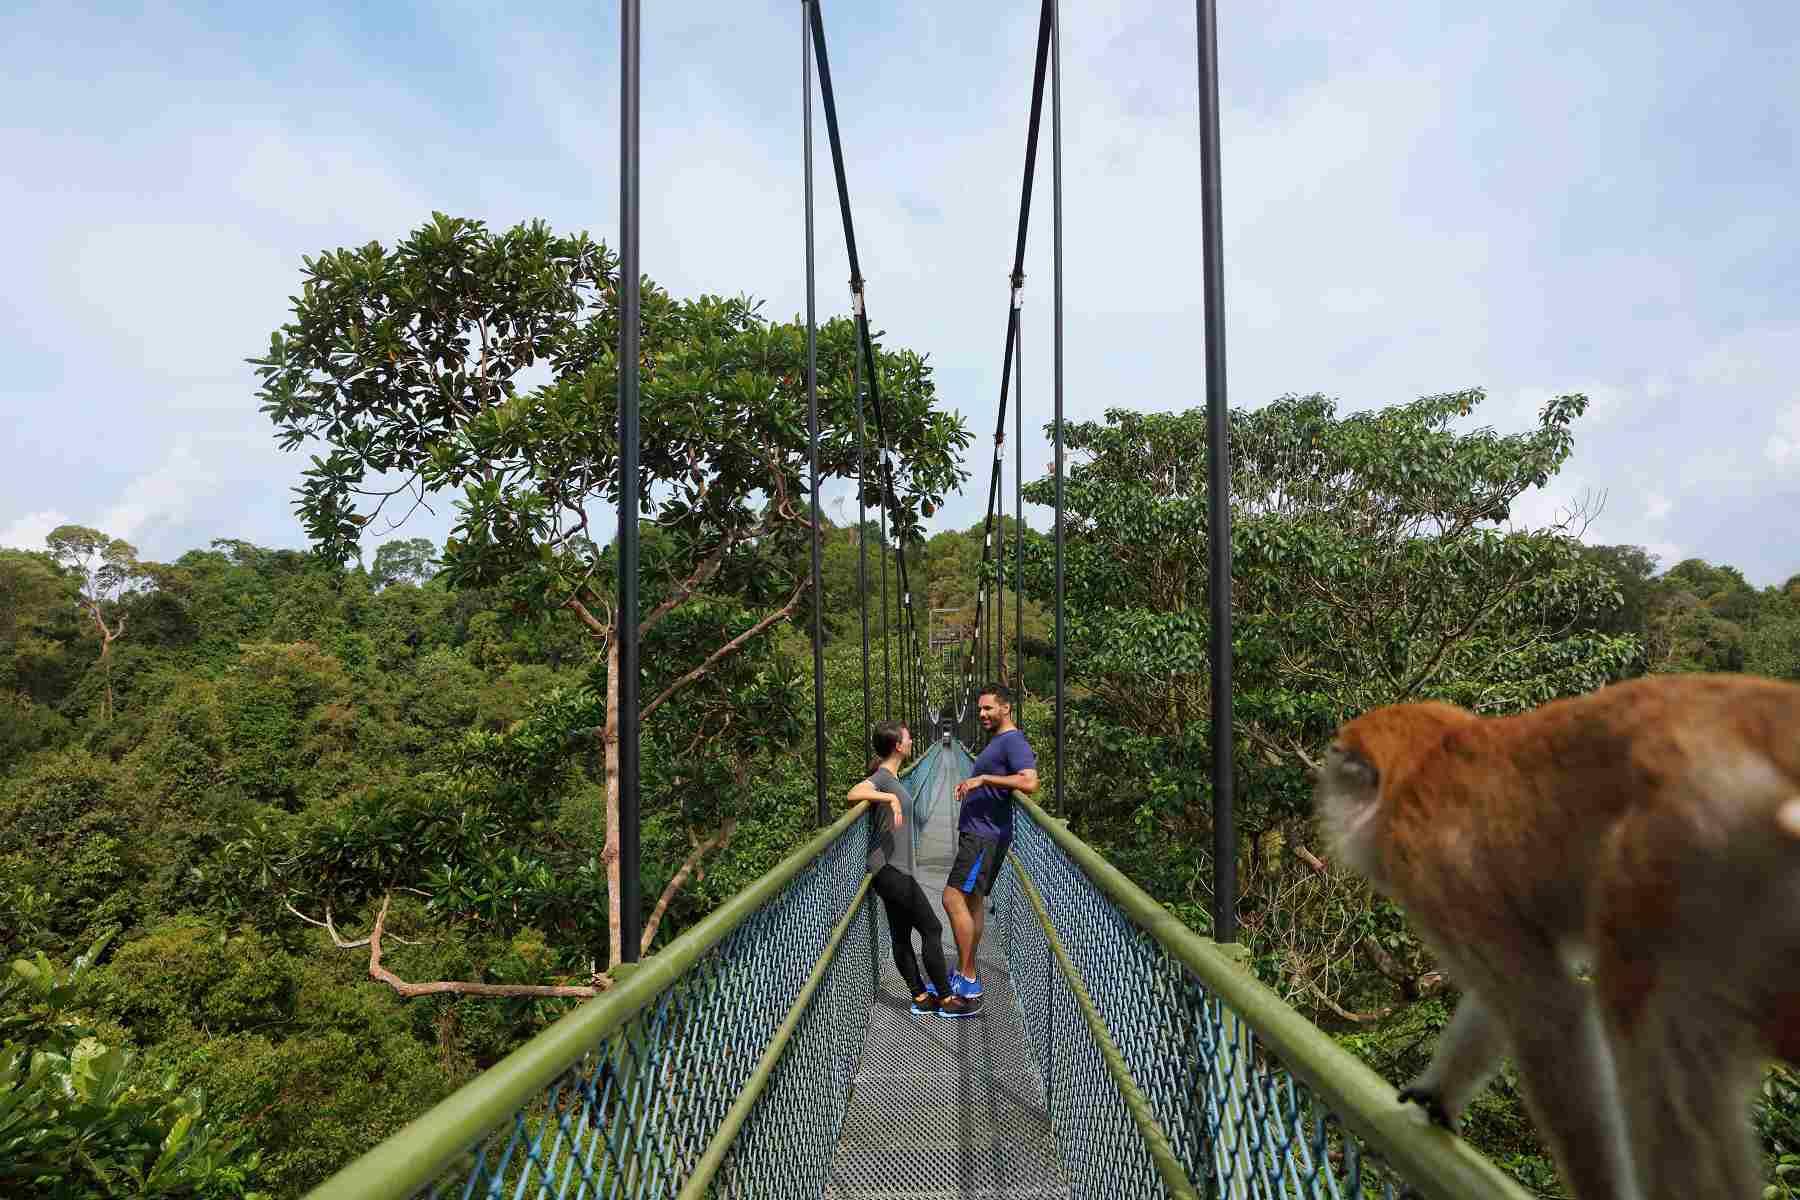 Canopy walk at Macritchie Reservoir Park, Singapore